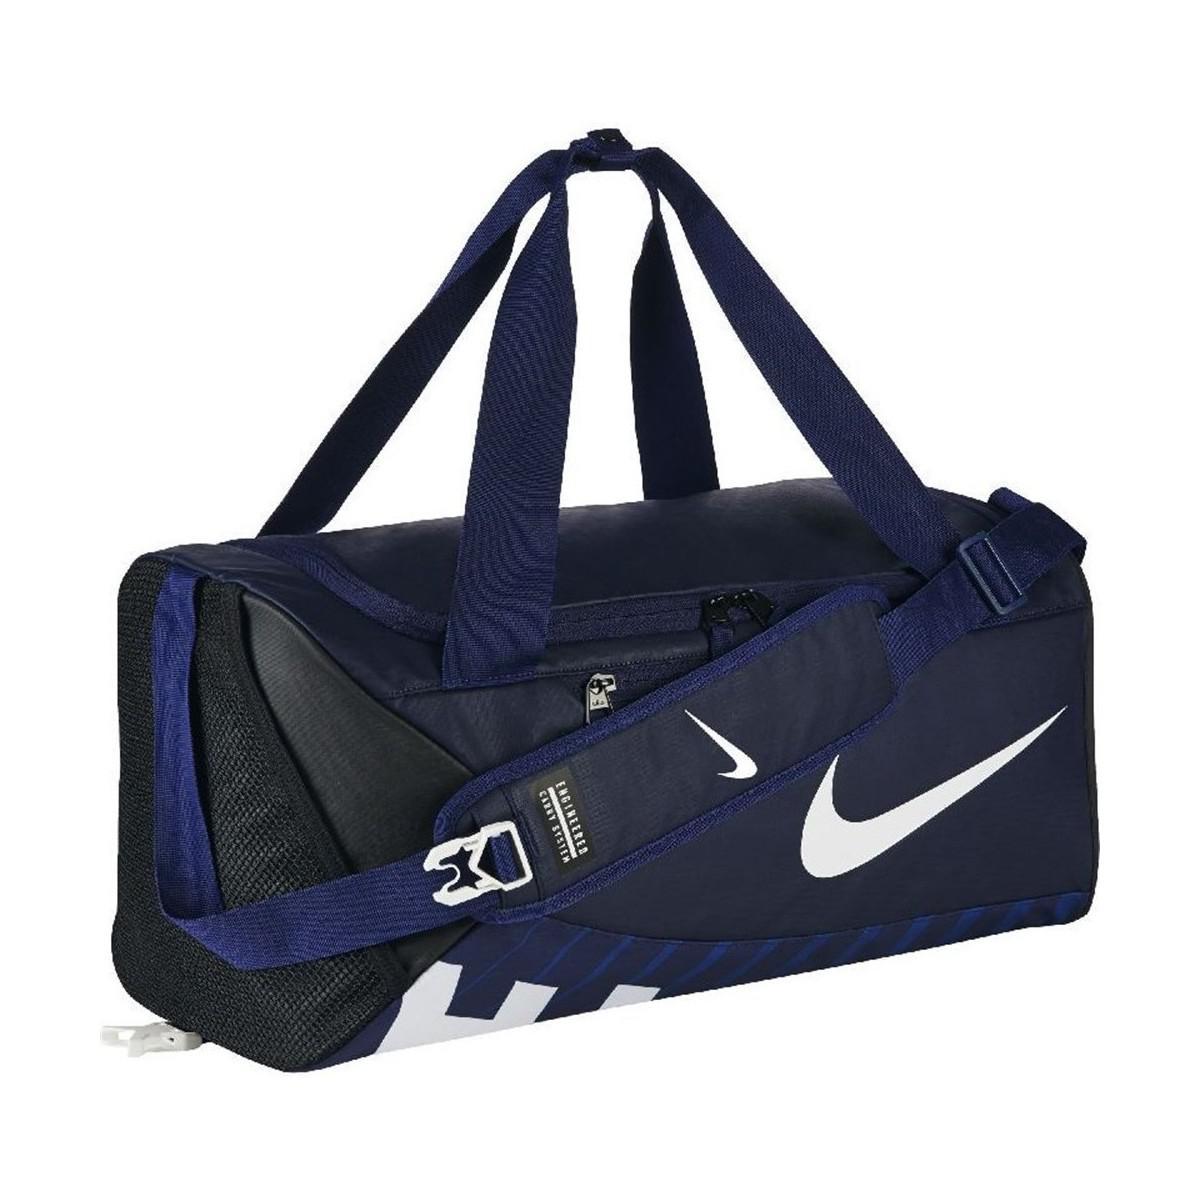 Nike Alpha Adapt Crossbody Small Ba5183 410 Men s Sports Bag In ... 8eff829ea9